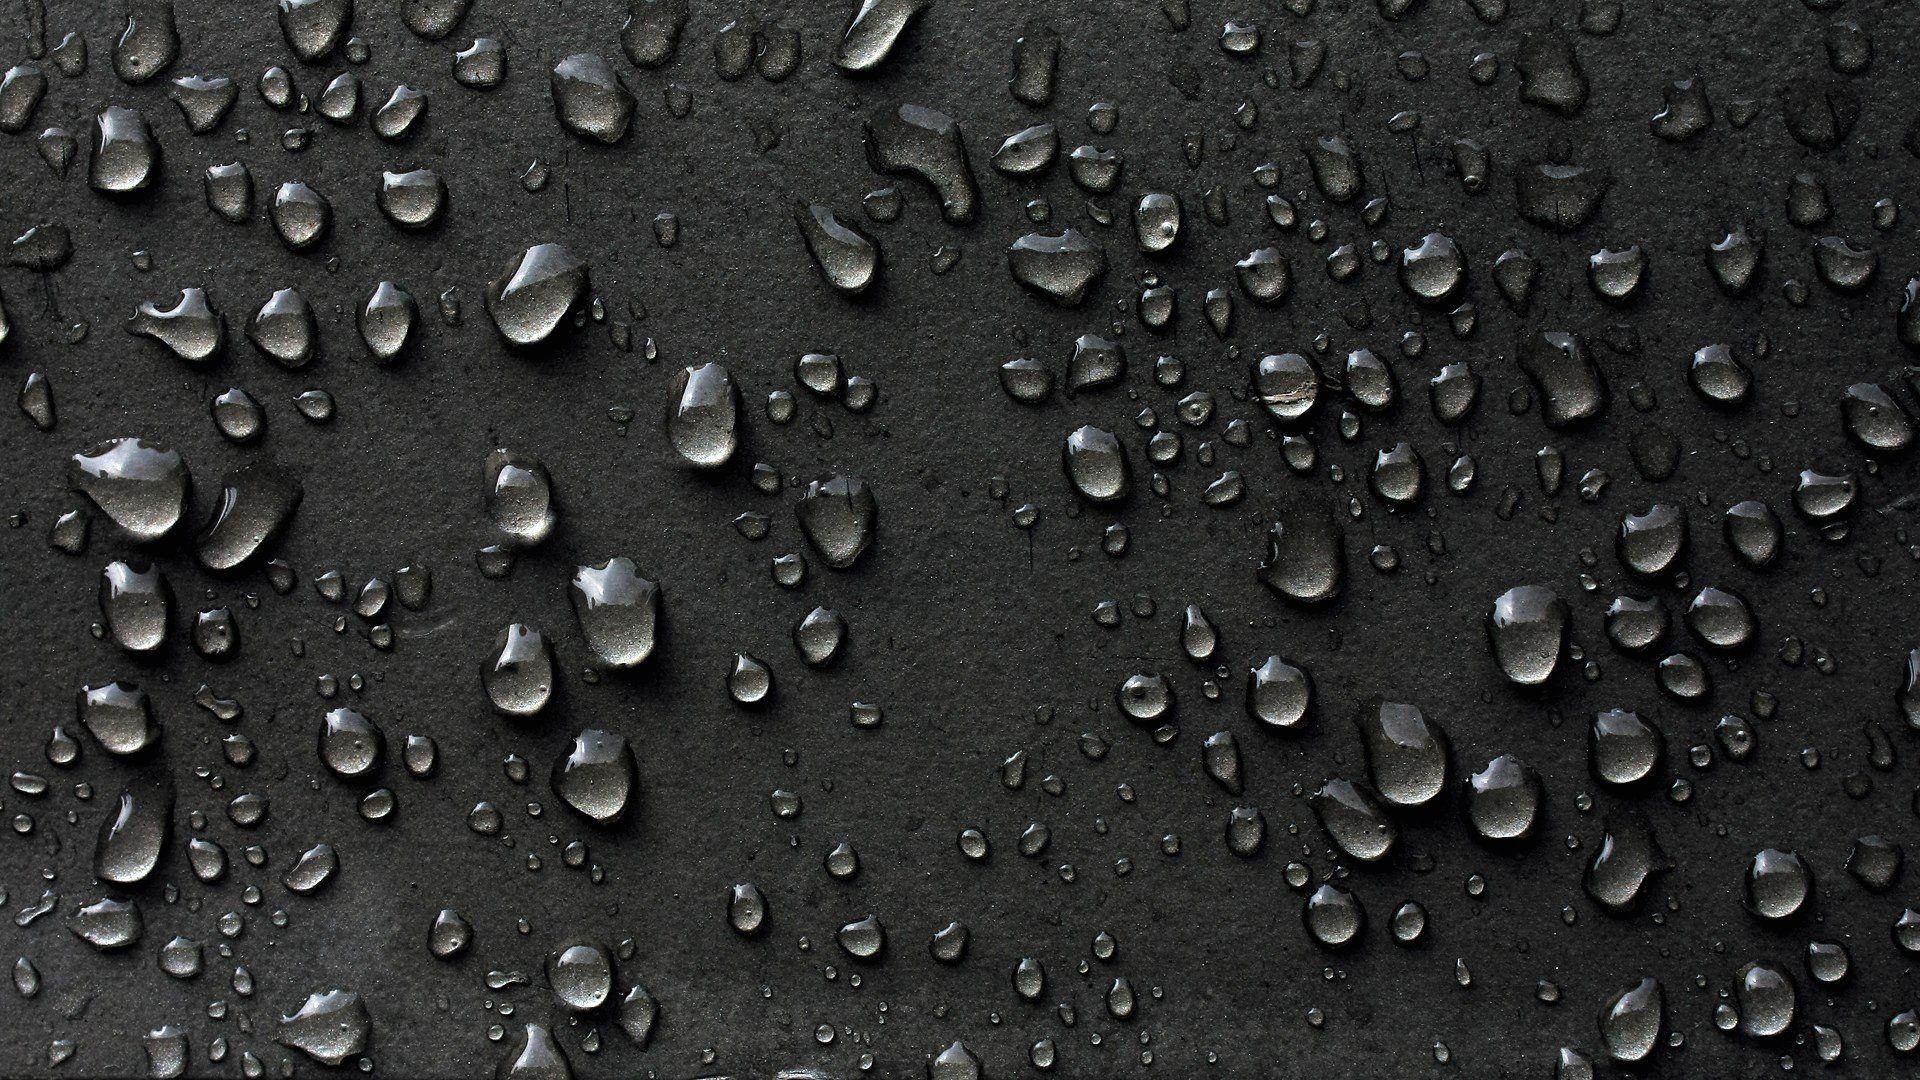 Wallpaper full hd pesquisa google texturas pinterest for Hd wallpapers for home walls